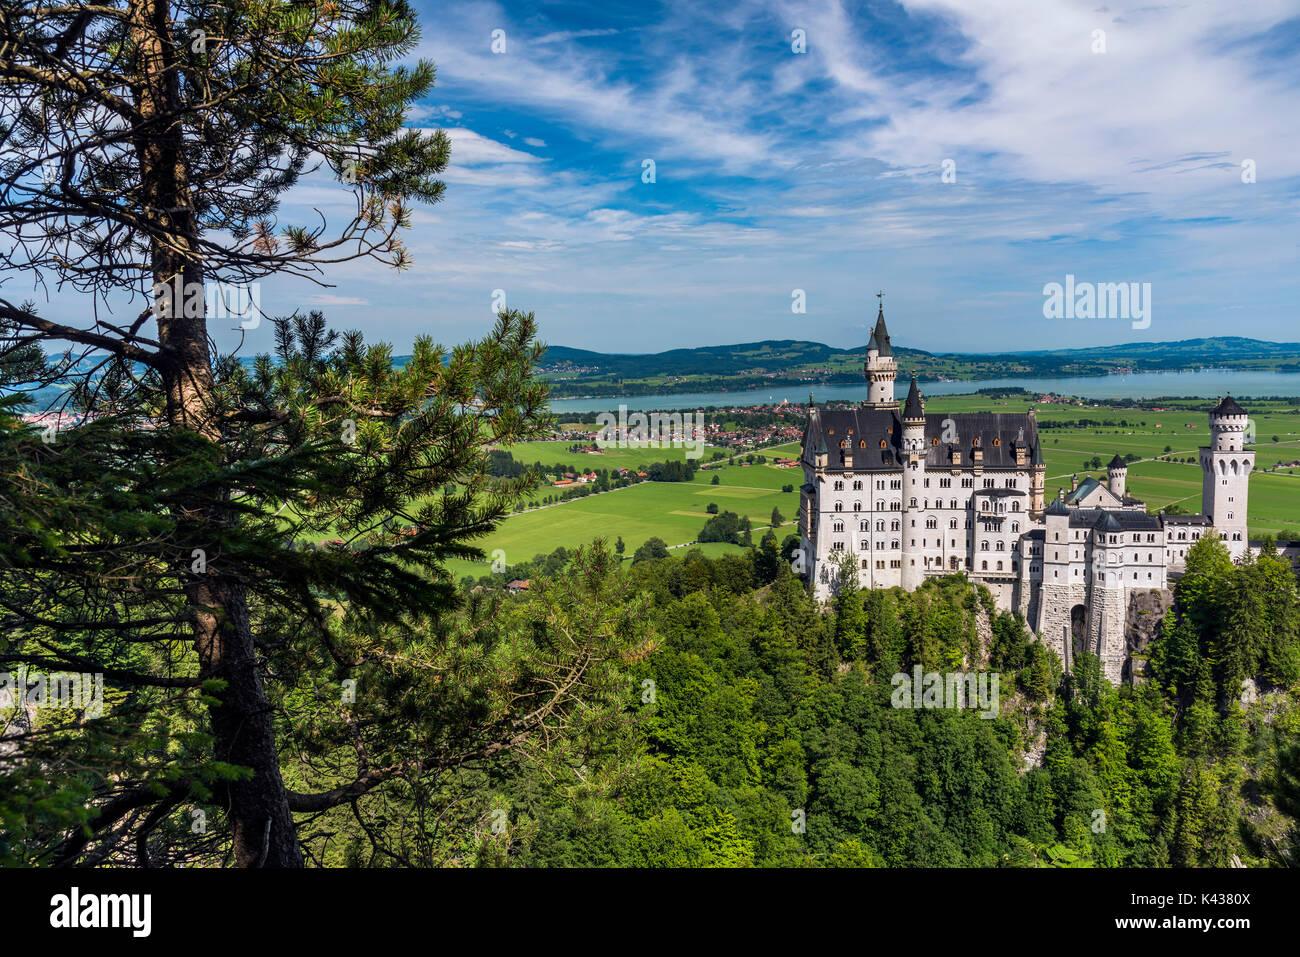 El castillo de Neuschwanstein o Schloss Neuschwanstein, Schwangau, Baviera, Alemania Imagen De Stock